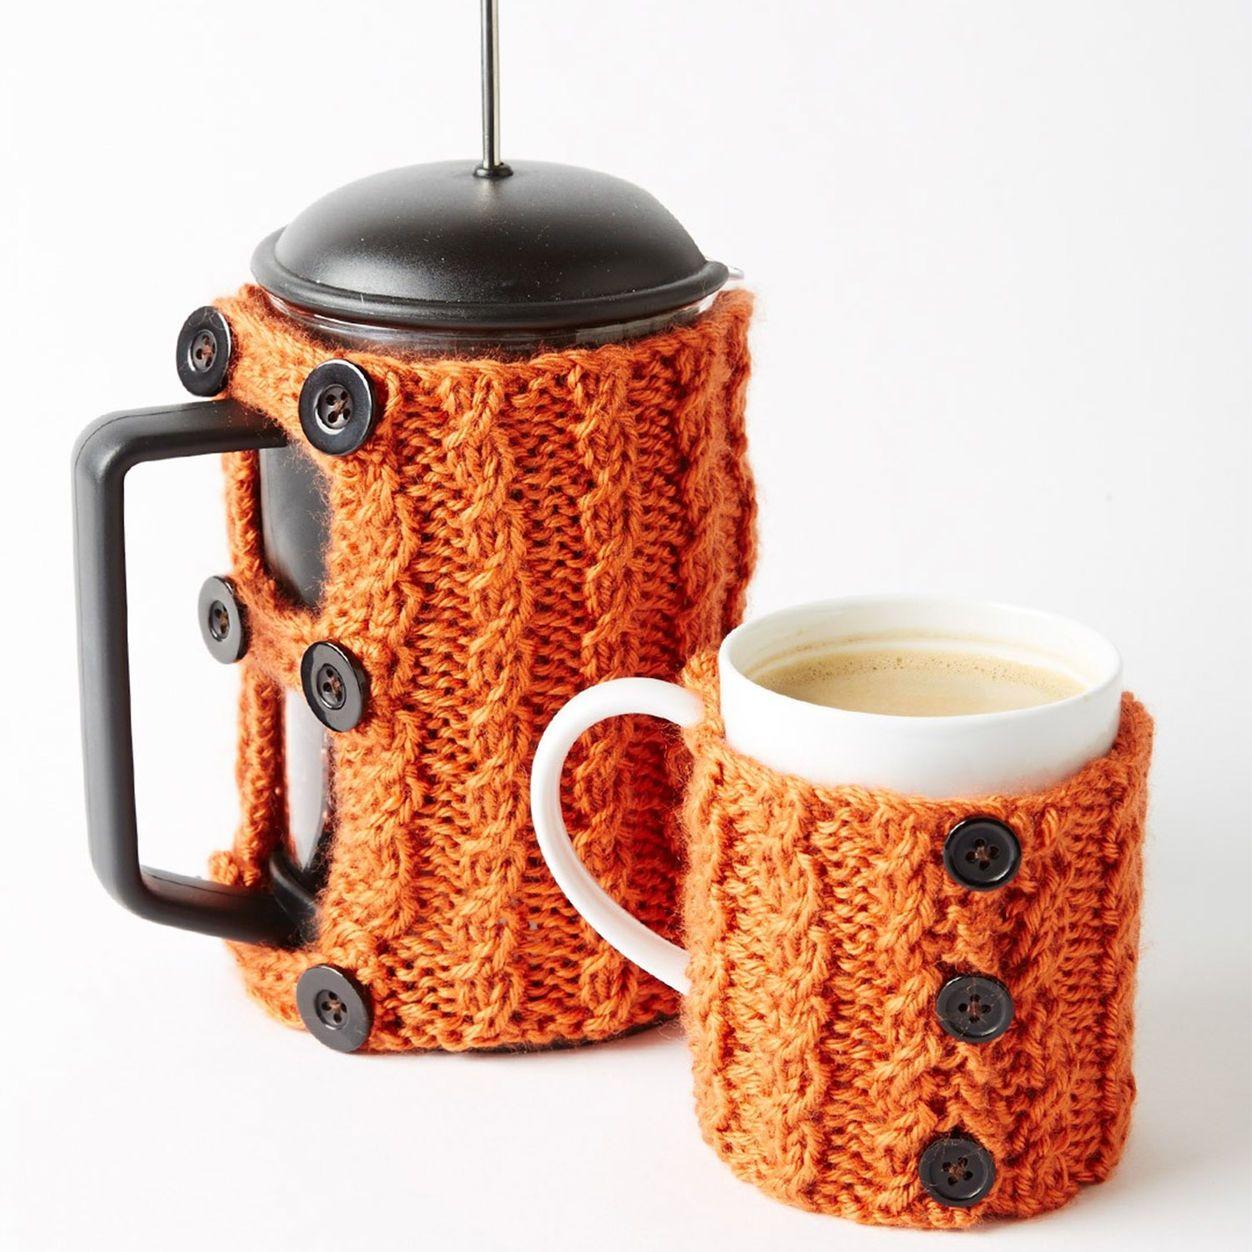 Free knitting pattern caron coffee press and mug cozies